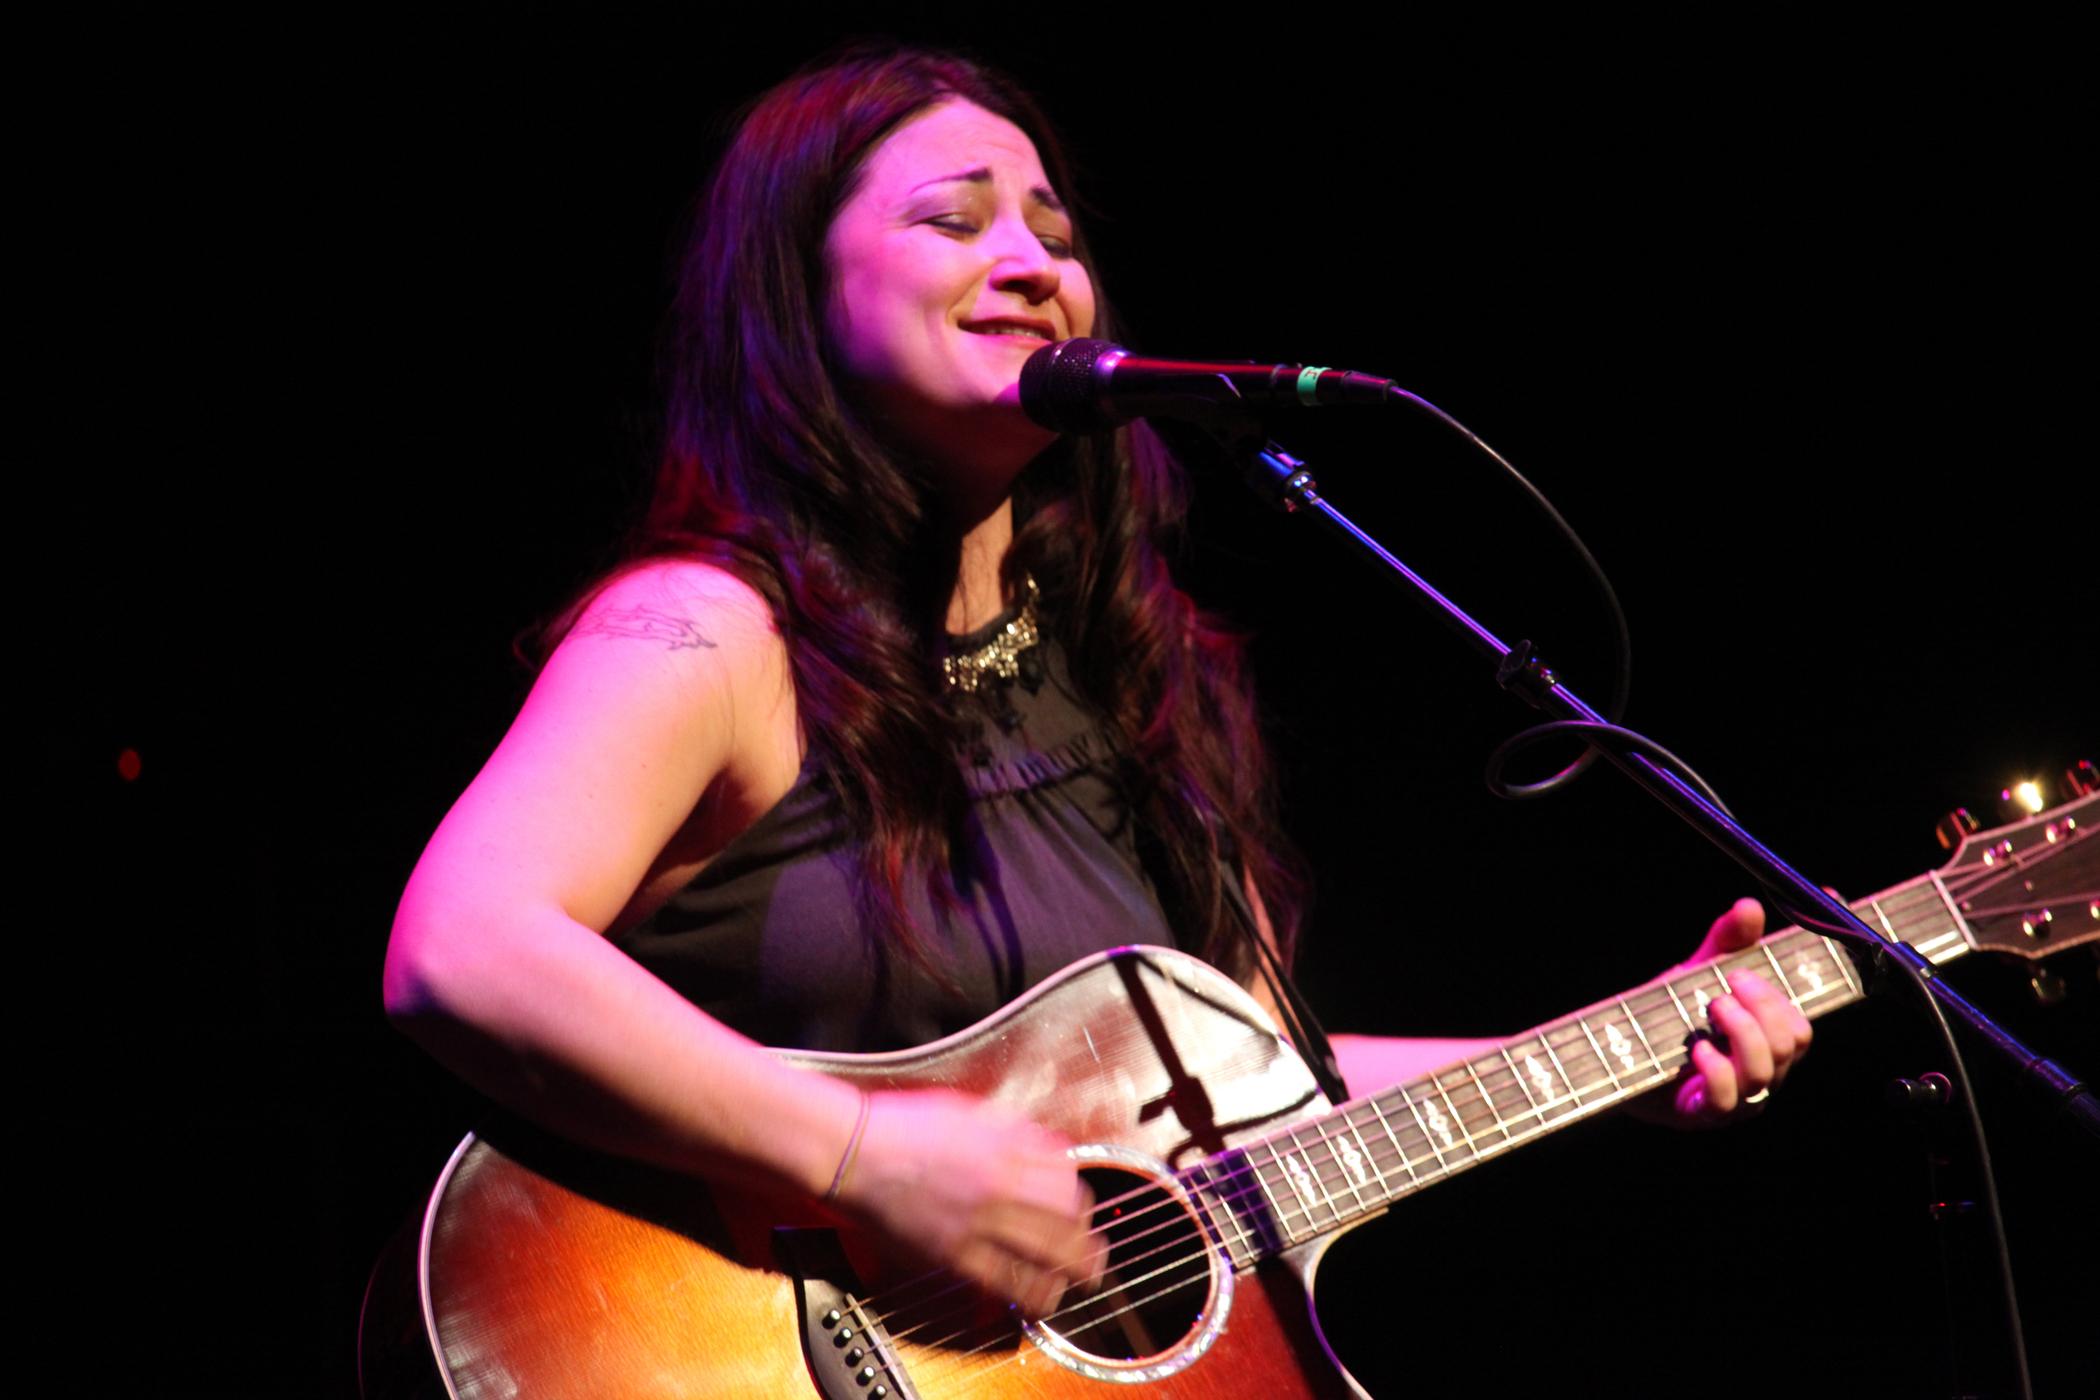 Jennifer Knapp Guitar Chords Guitar Tabs And Lyrics Songs From Chordie